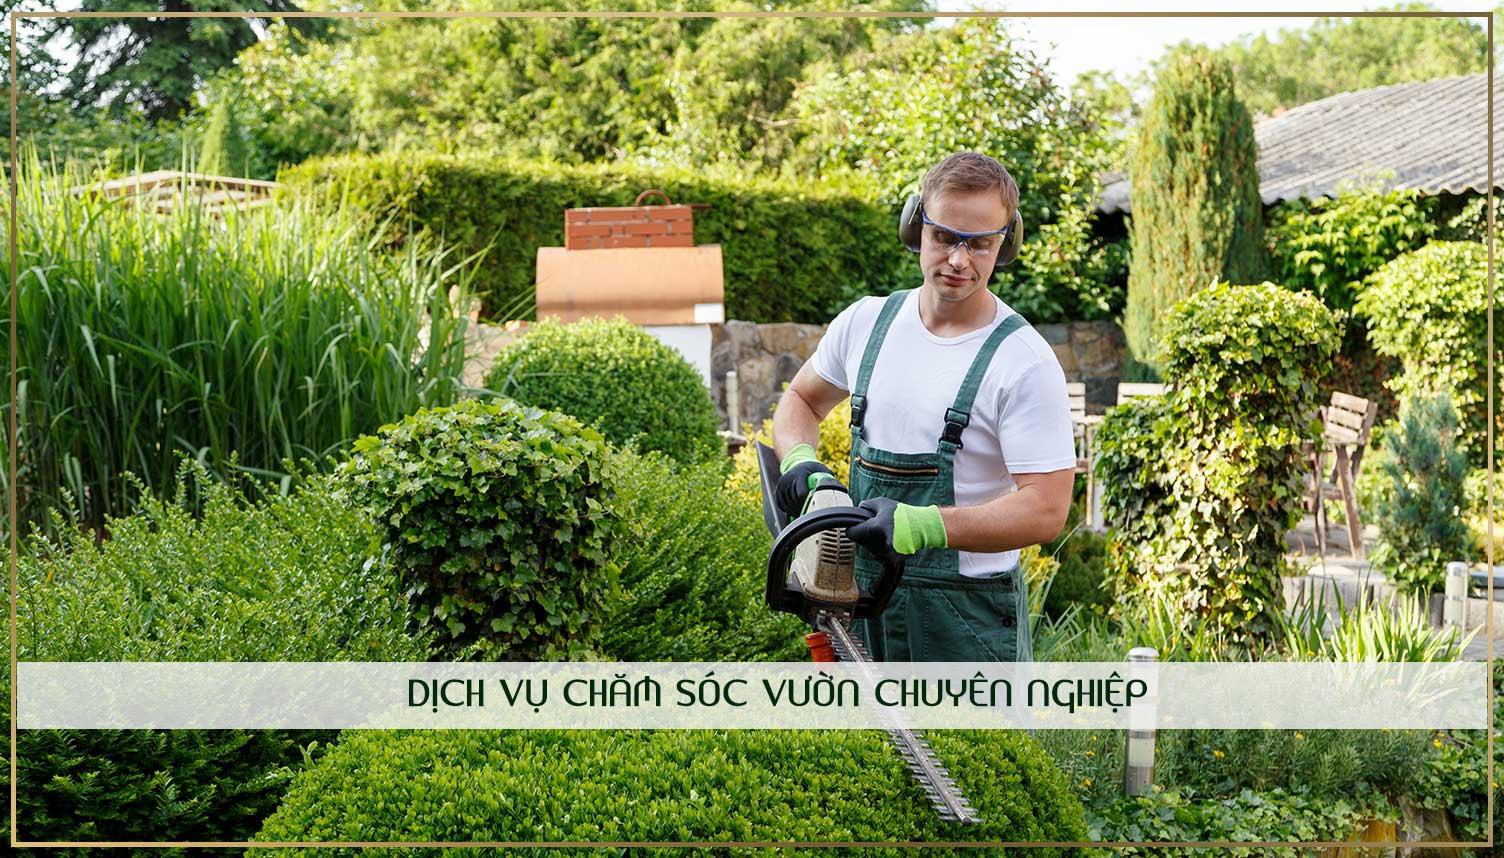 cham-soc-san-vuon-biet-thu-saigon-garden-siverside